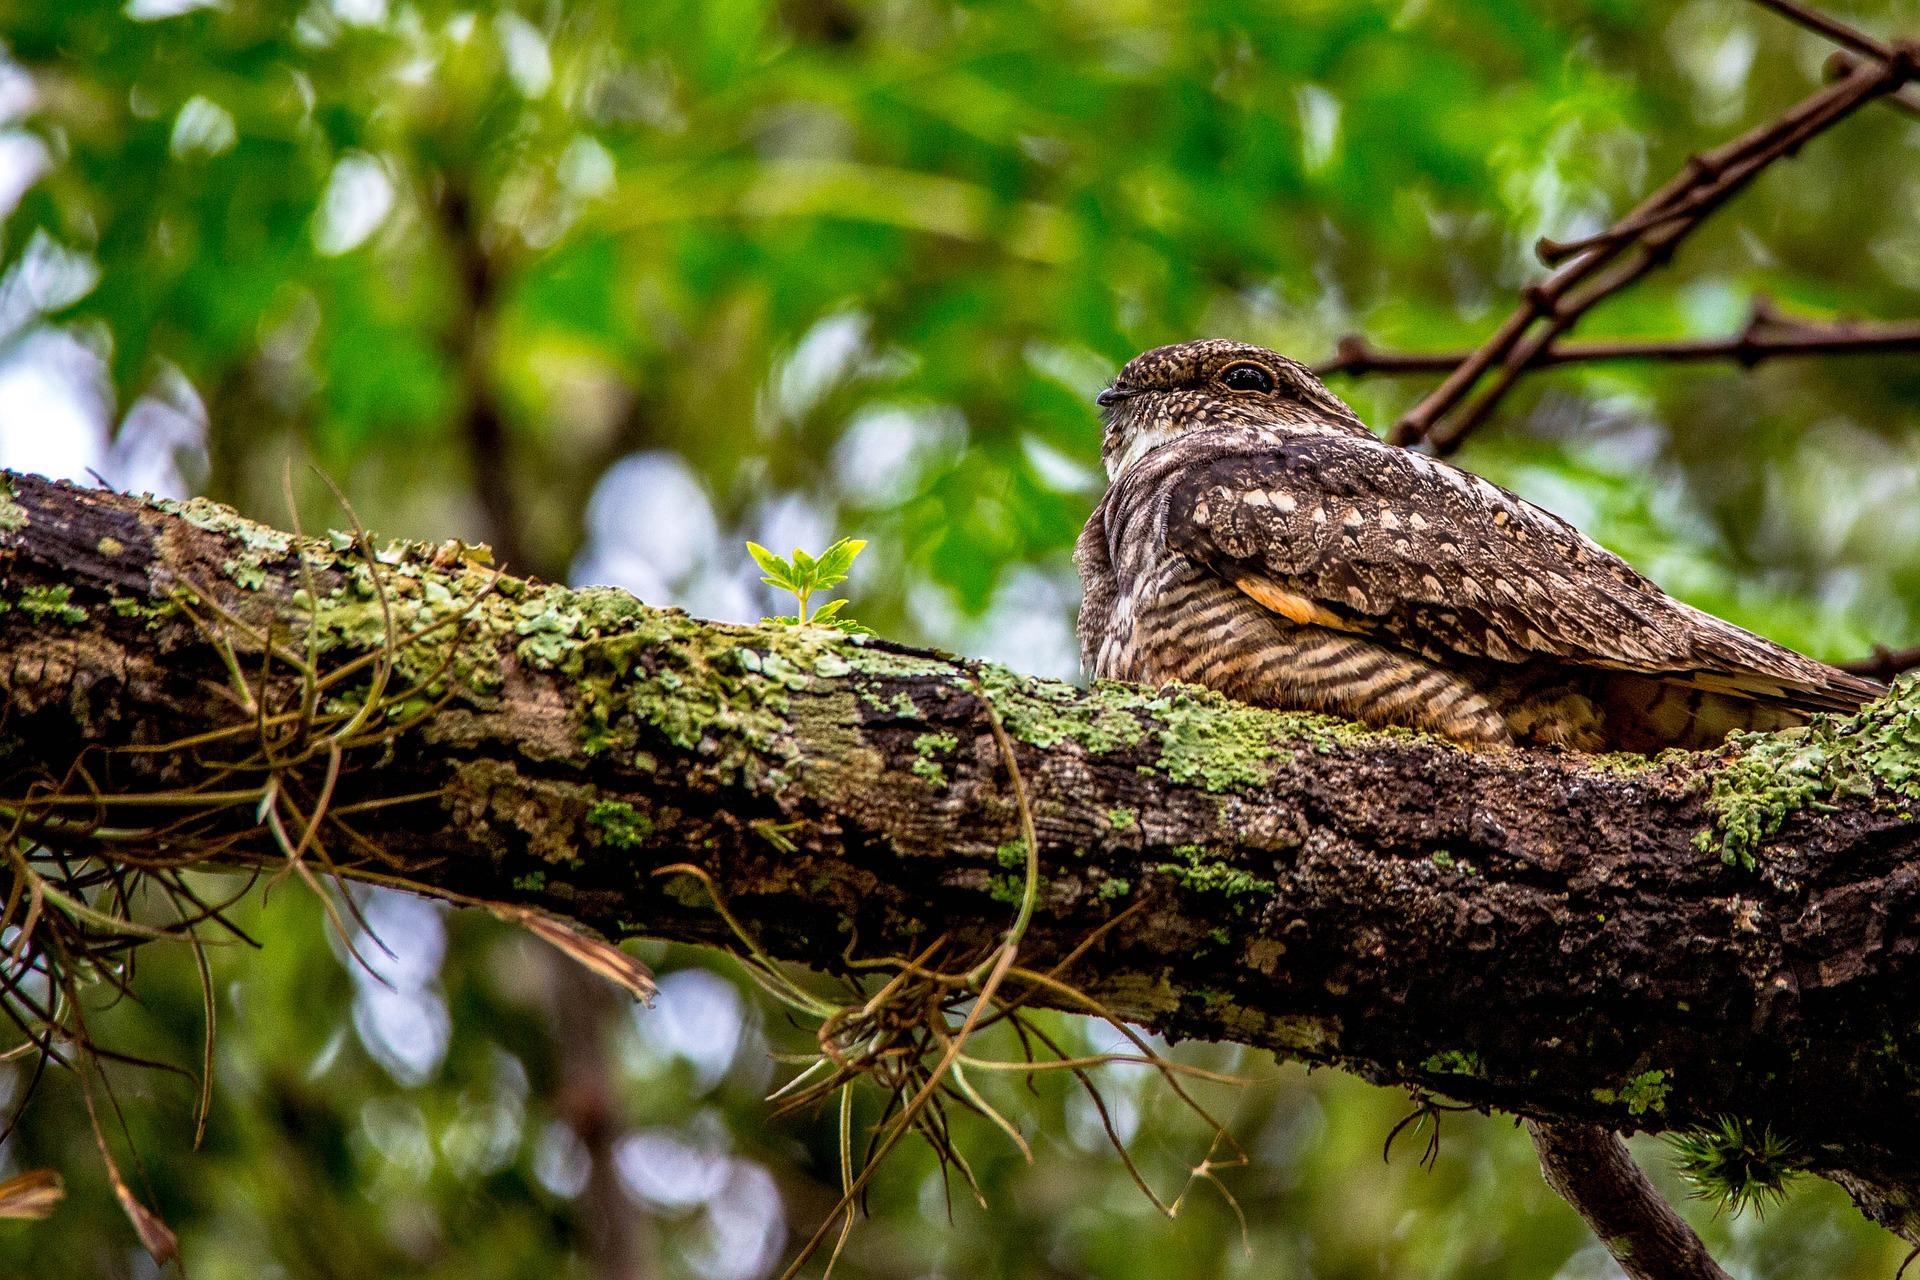 An unasumming brown bird sits on a branch.